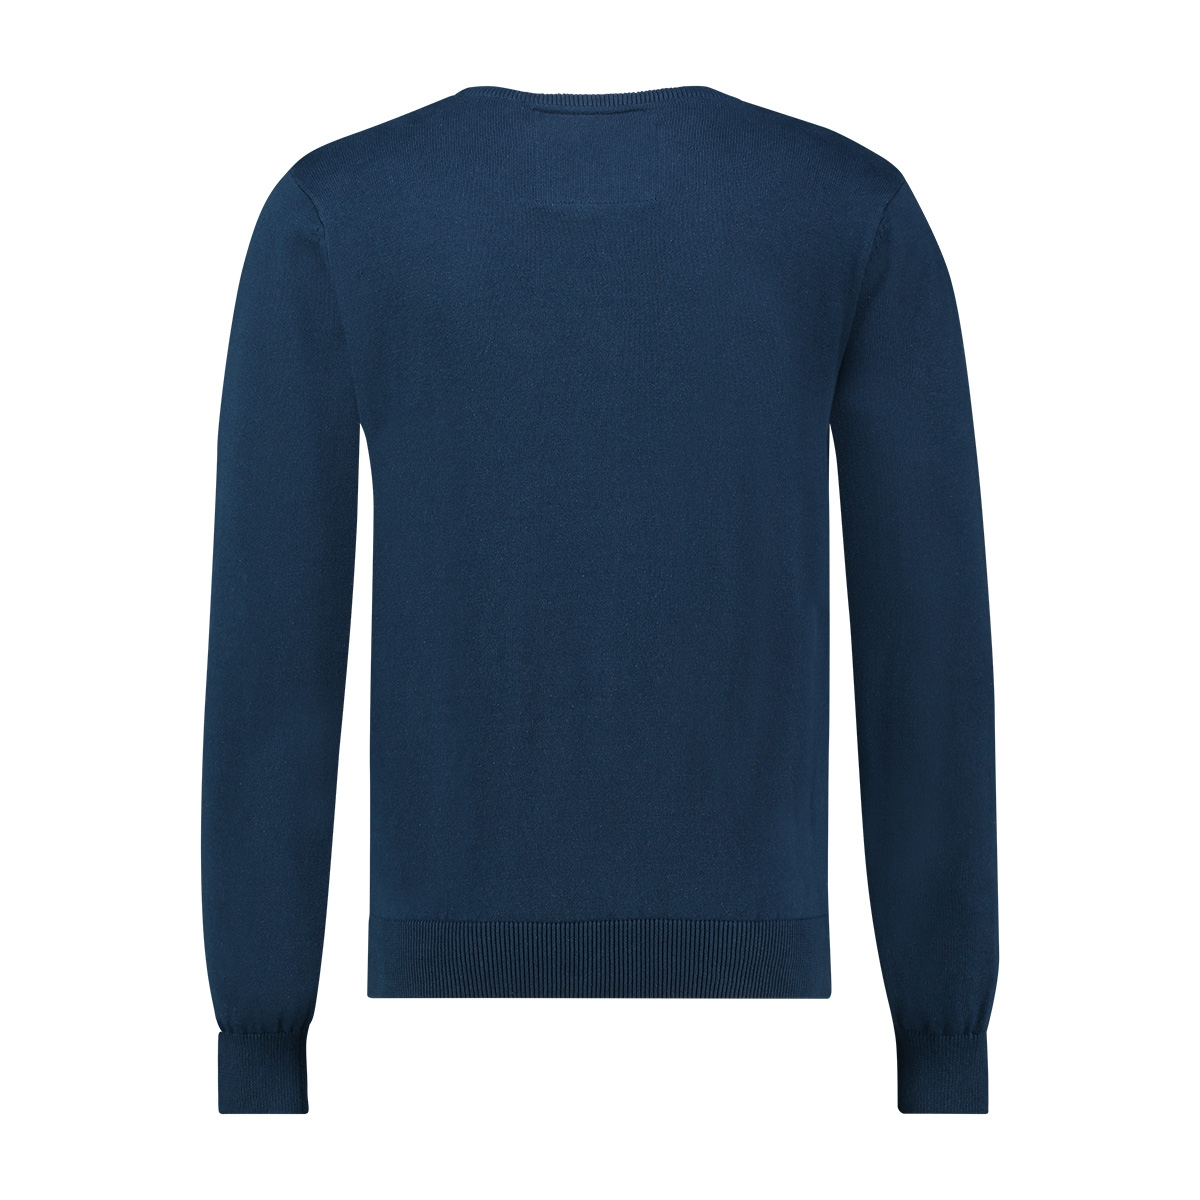 knit o zig zag mu12 0200 haze & finn trui navy multi